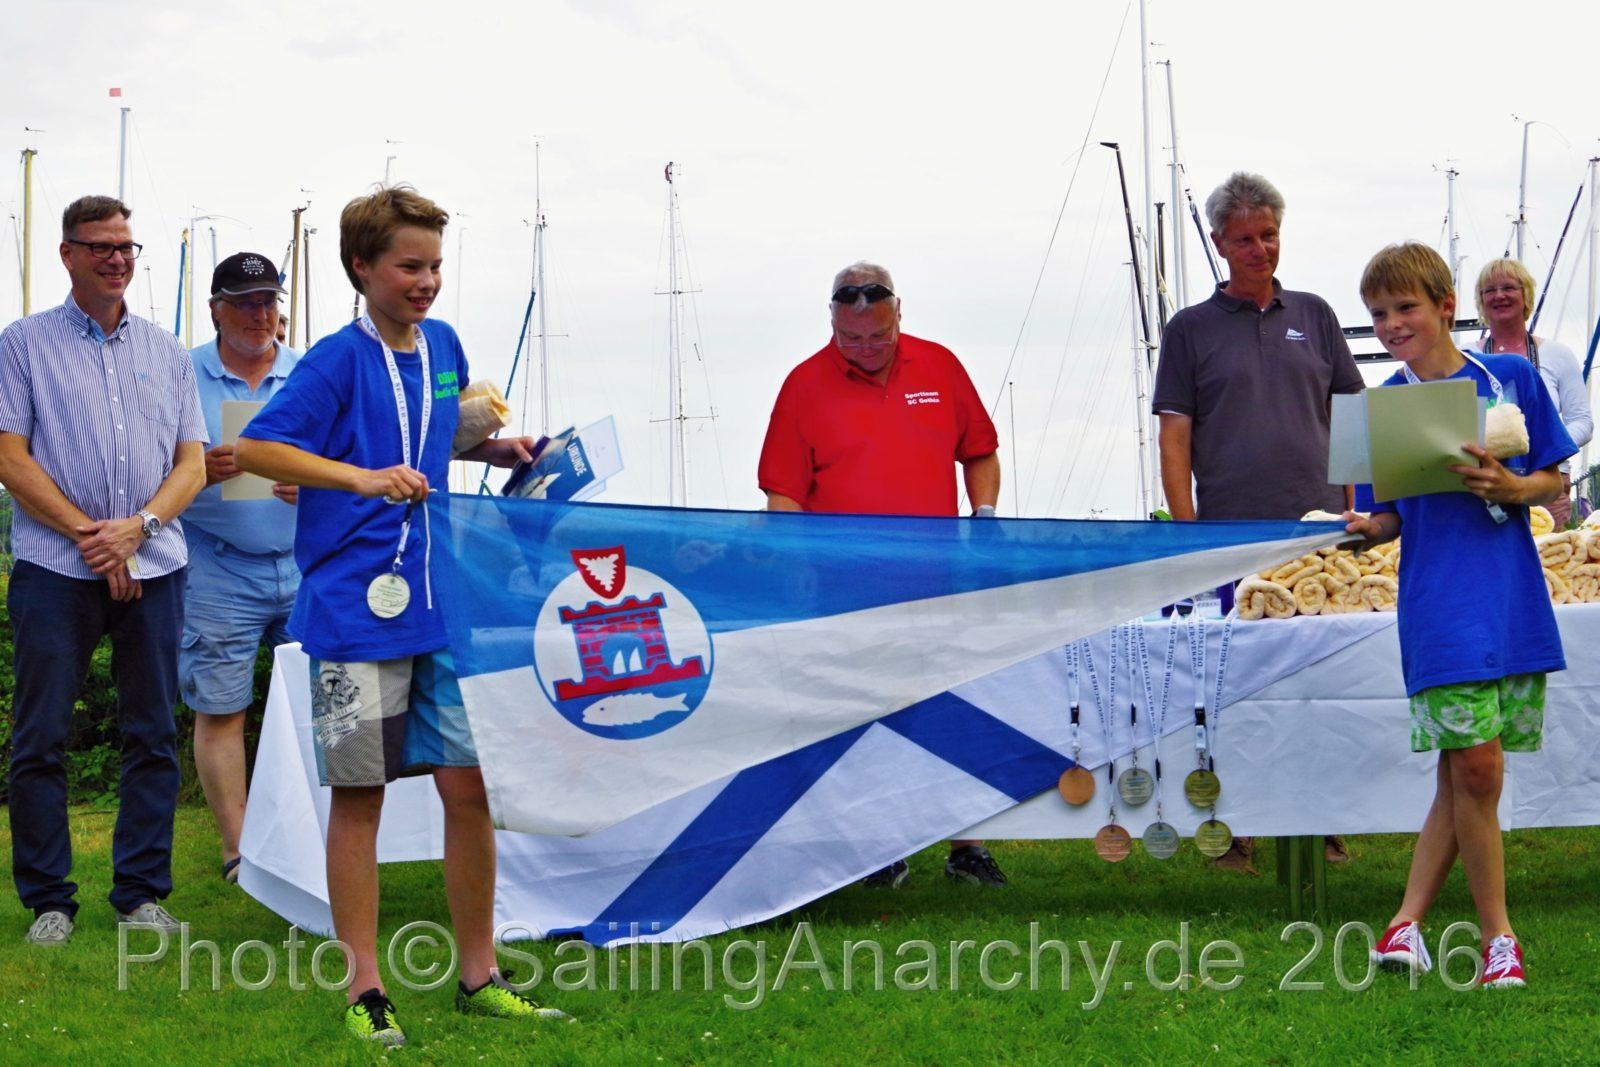 GER 718, Nik und Oke Mommensen – 1. Platz U14 Wertung - IDJüM 2016 im Teeny im SC Gothia e.V. in Berlin Spandau, 29. Juli 2016